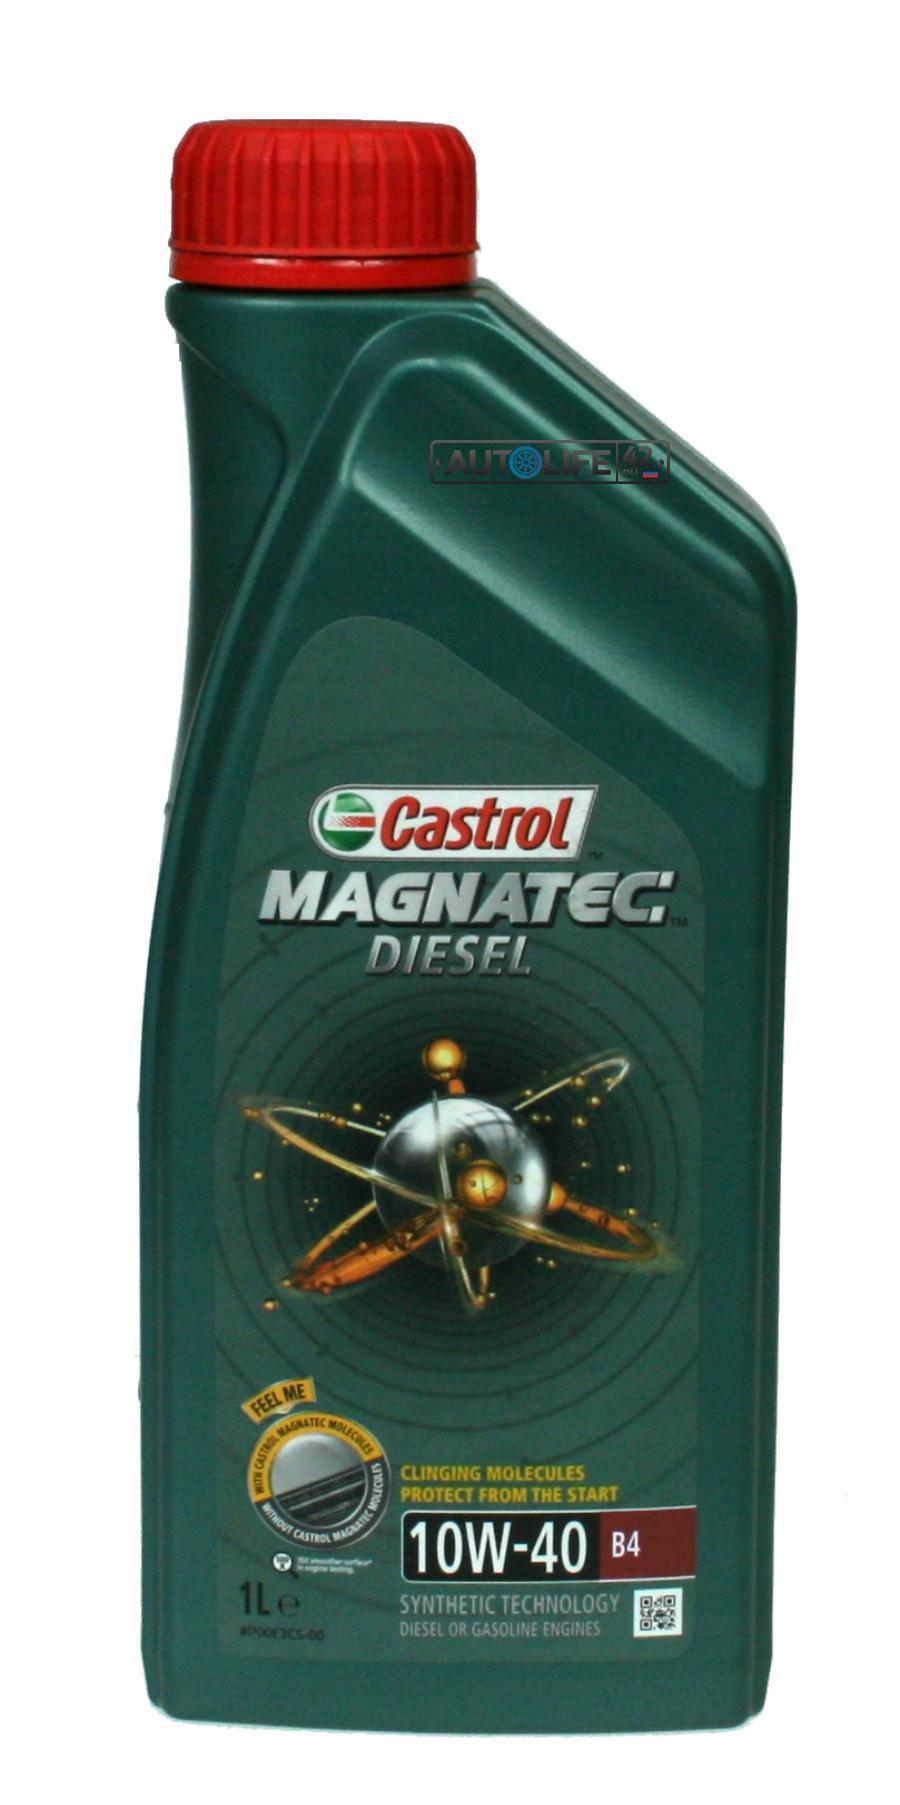 Castrol 10W40 (1L) Magnatec Diesel B4 Dualock_масло моторное (полусинт.)\ ACEA A3/B4, API